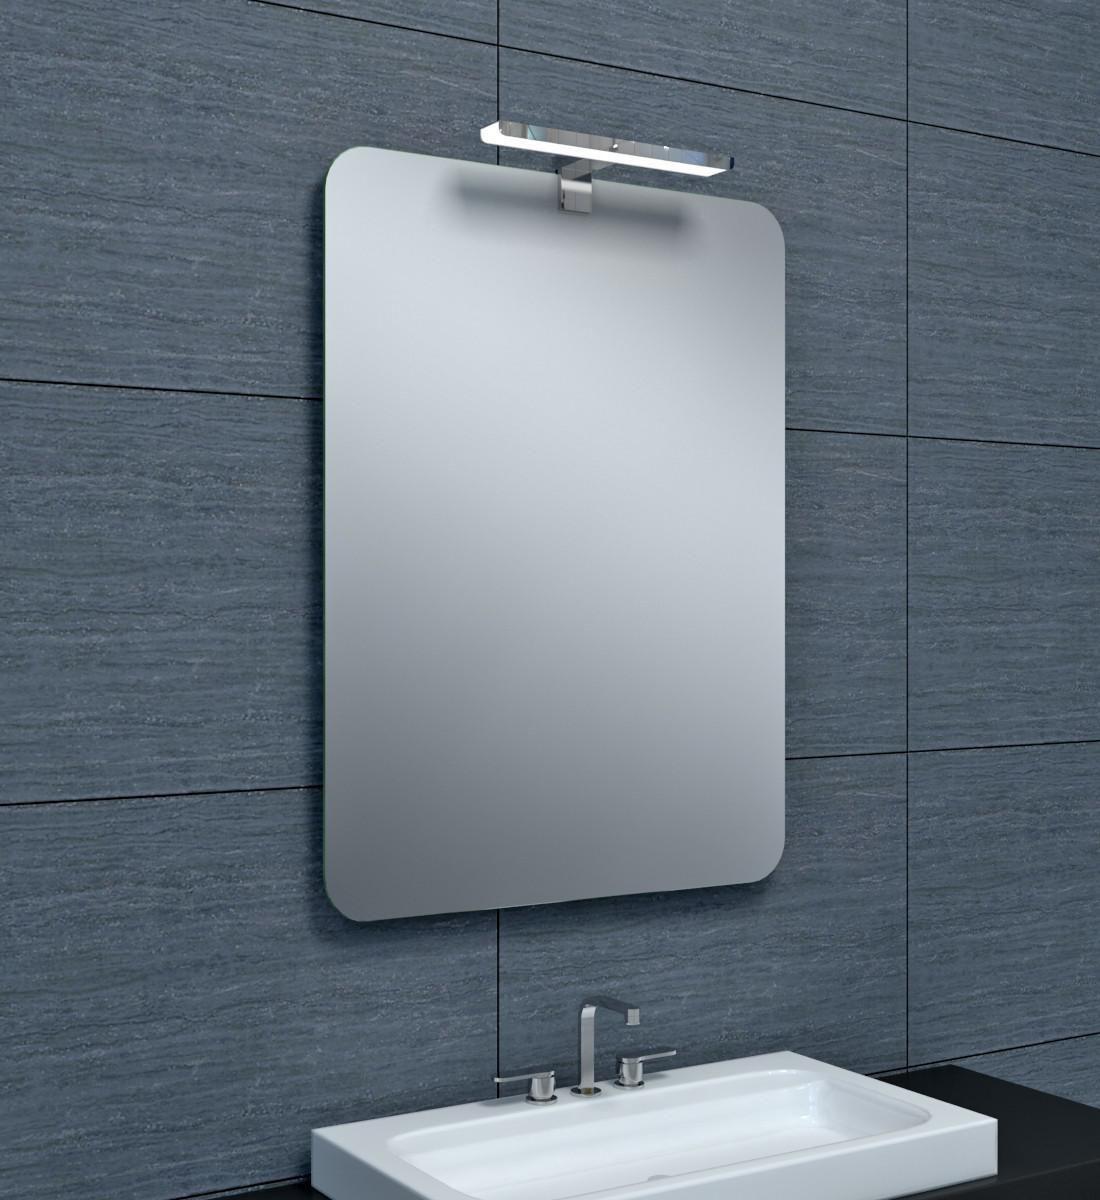 Alterna miroir milan 60 x hauteur 80 cm cedeo - Hauteur d un miroir de salle de bain ...